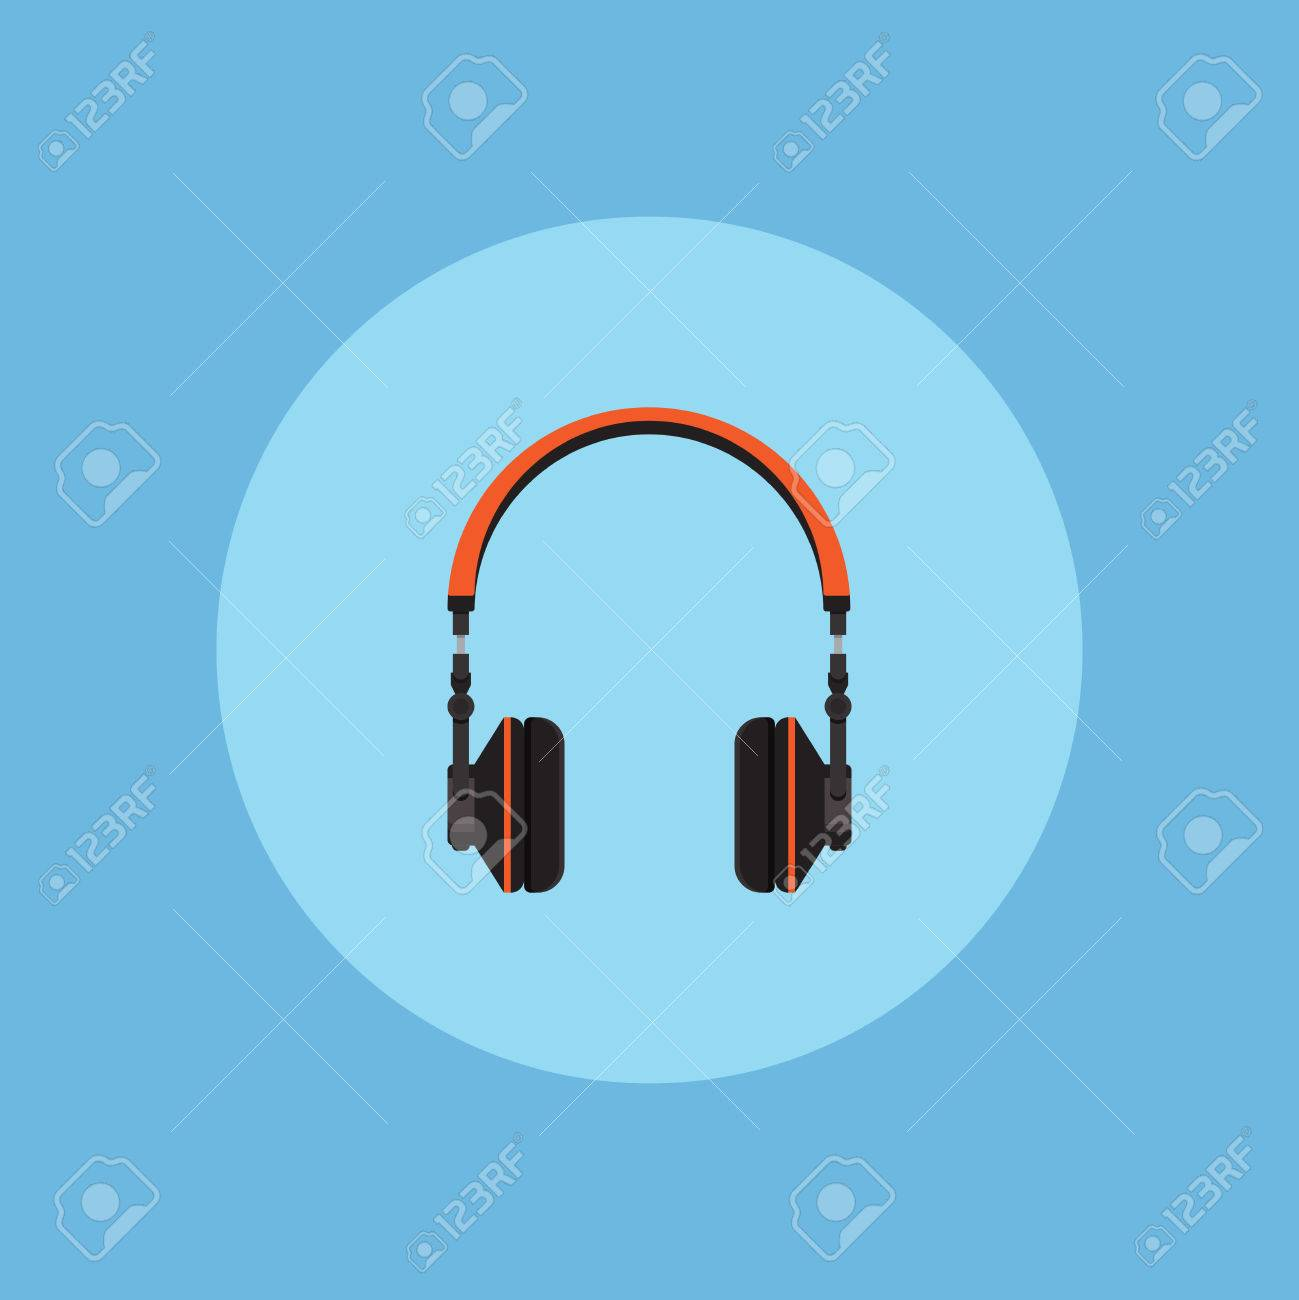 Headphones on blue background vector concept  Headset illustration